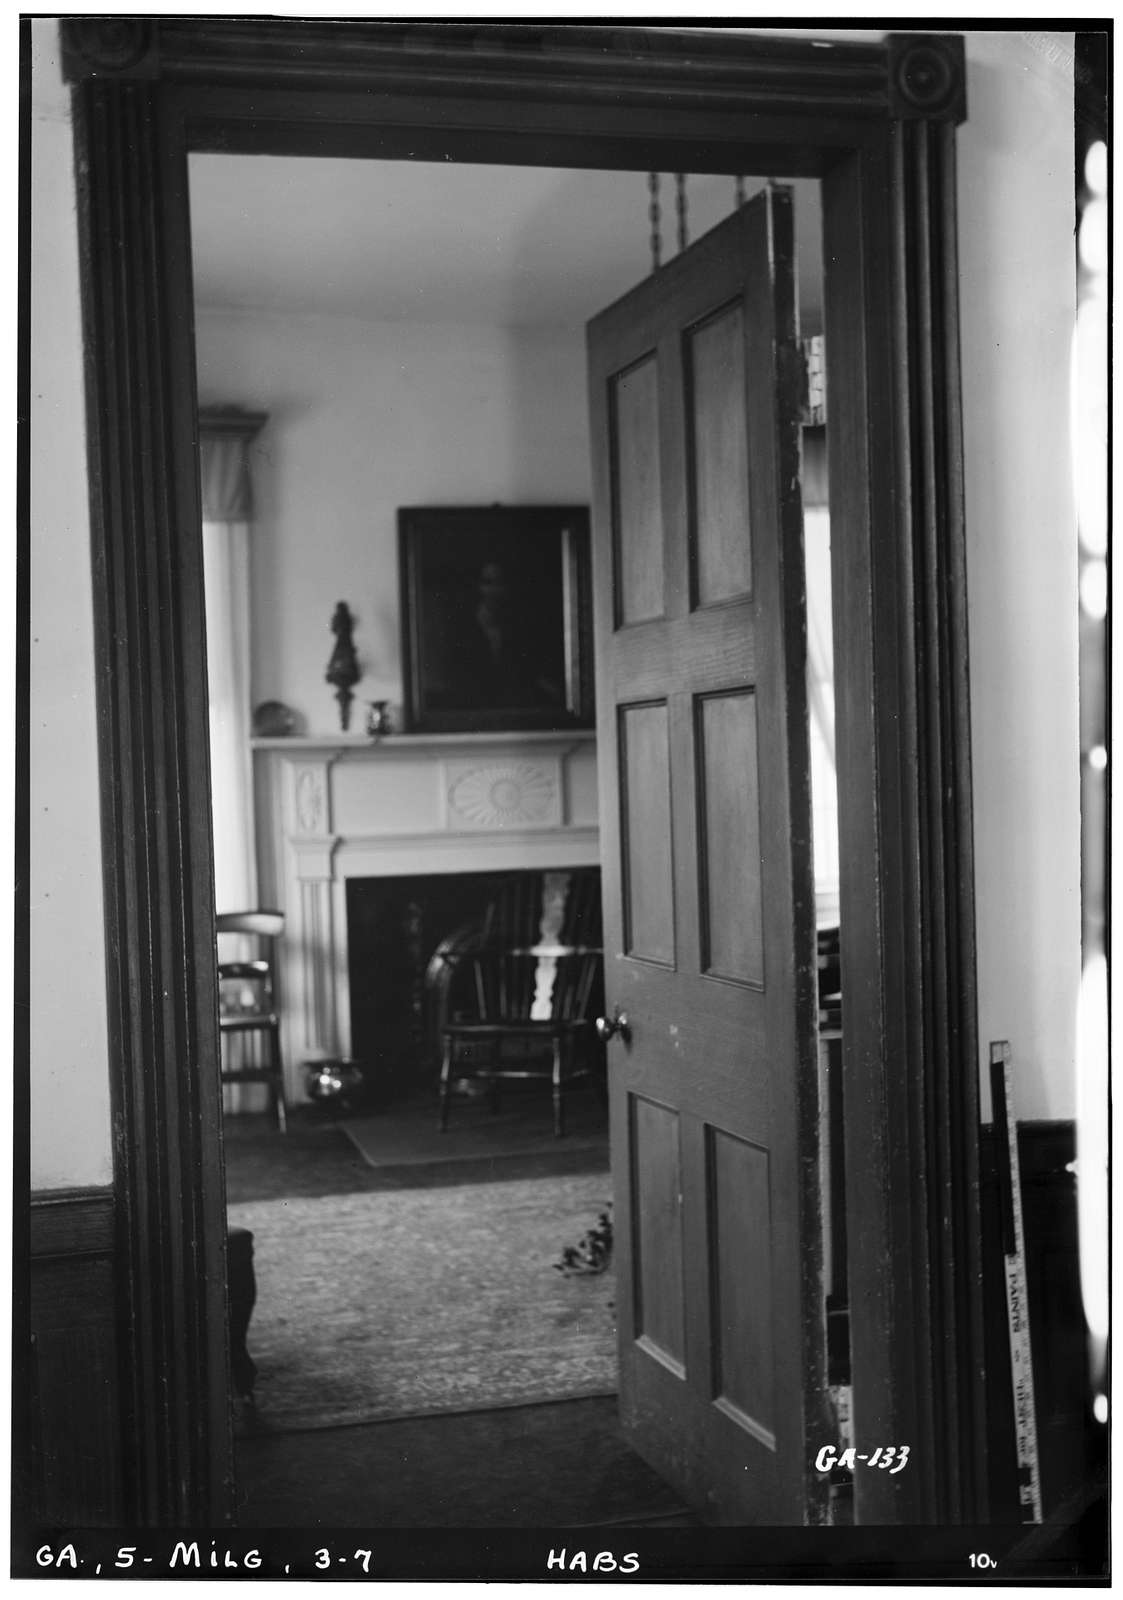 Williams-Orme-Crawford House, 211 Liberty Street, Milledgeville, Baldwin County, GA